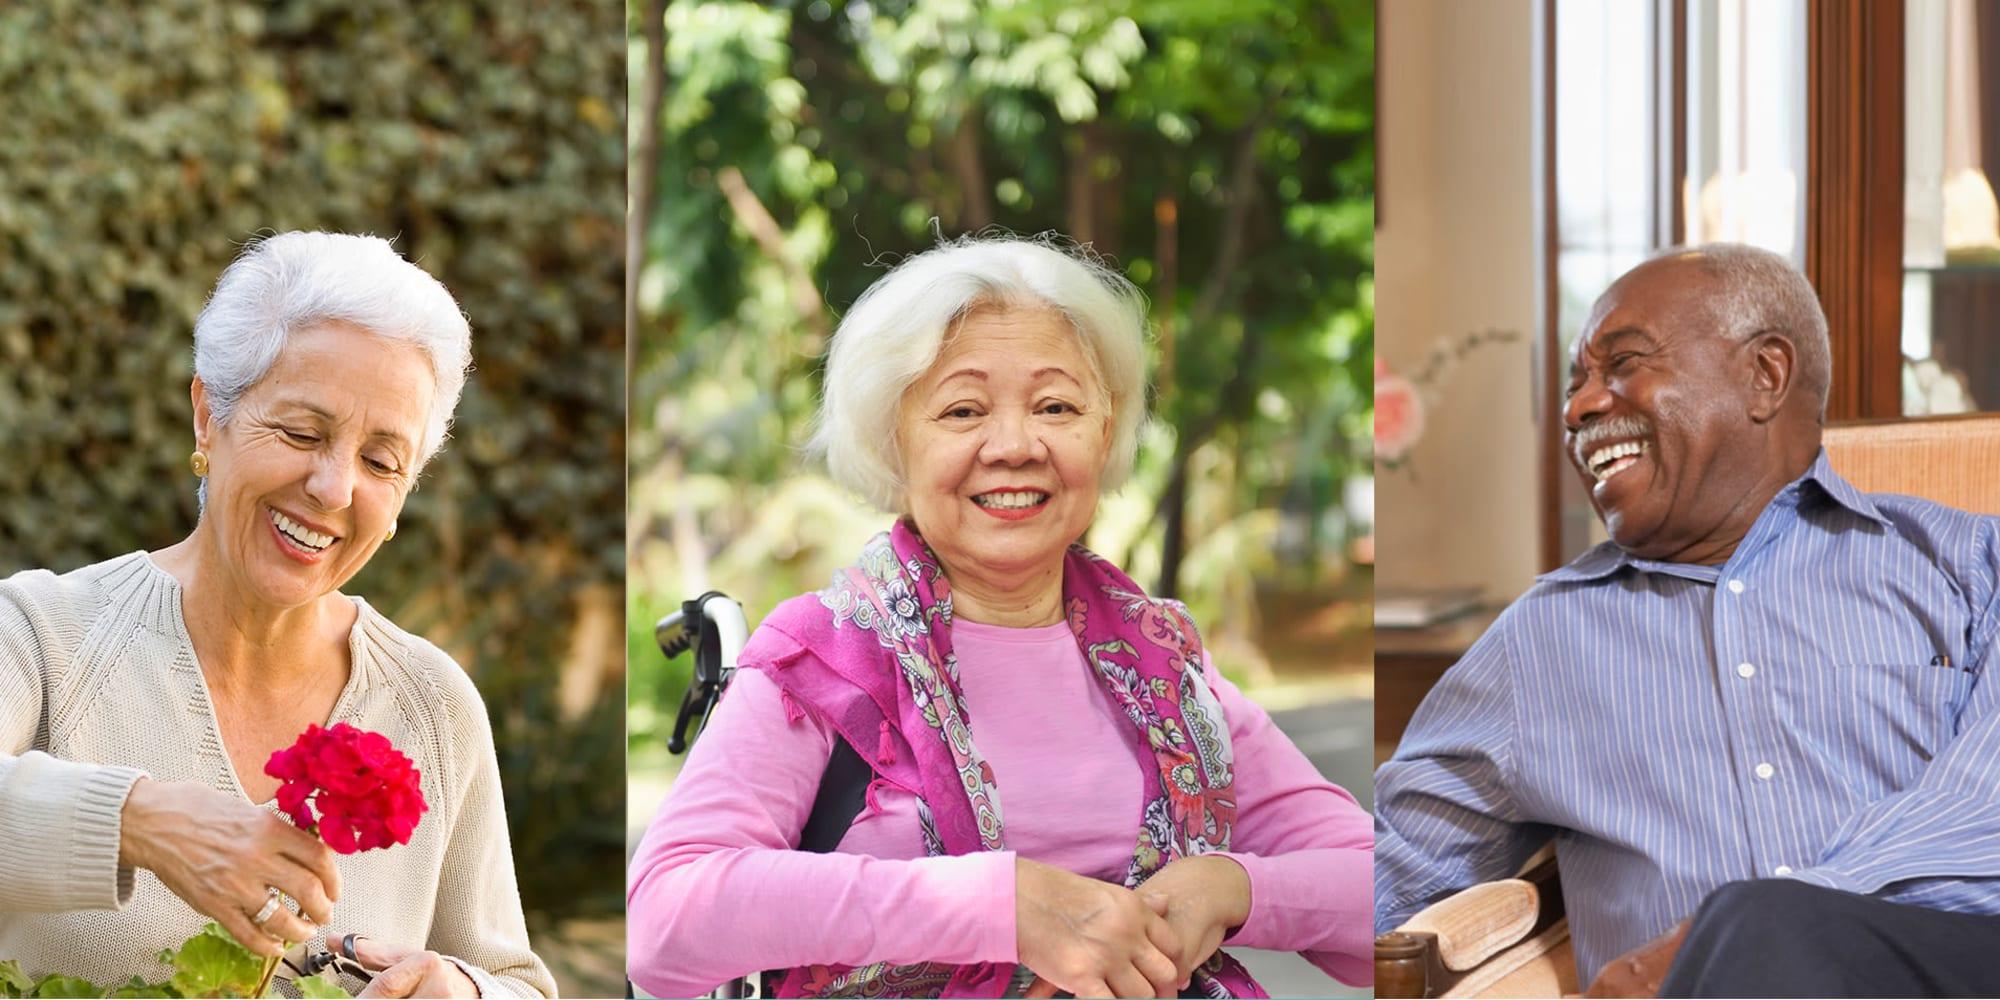 Senior living at Grand Victorian of Sycamore in Sycamore, Illinois